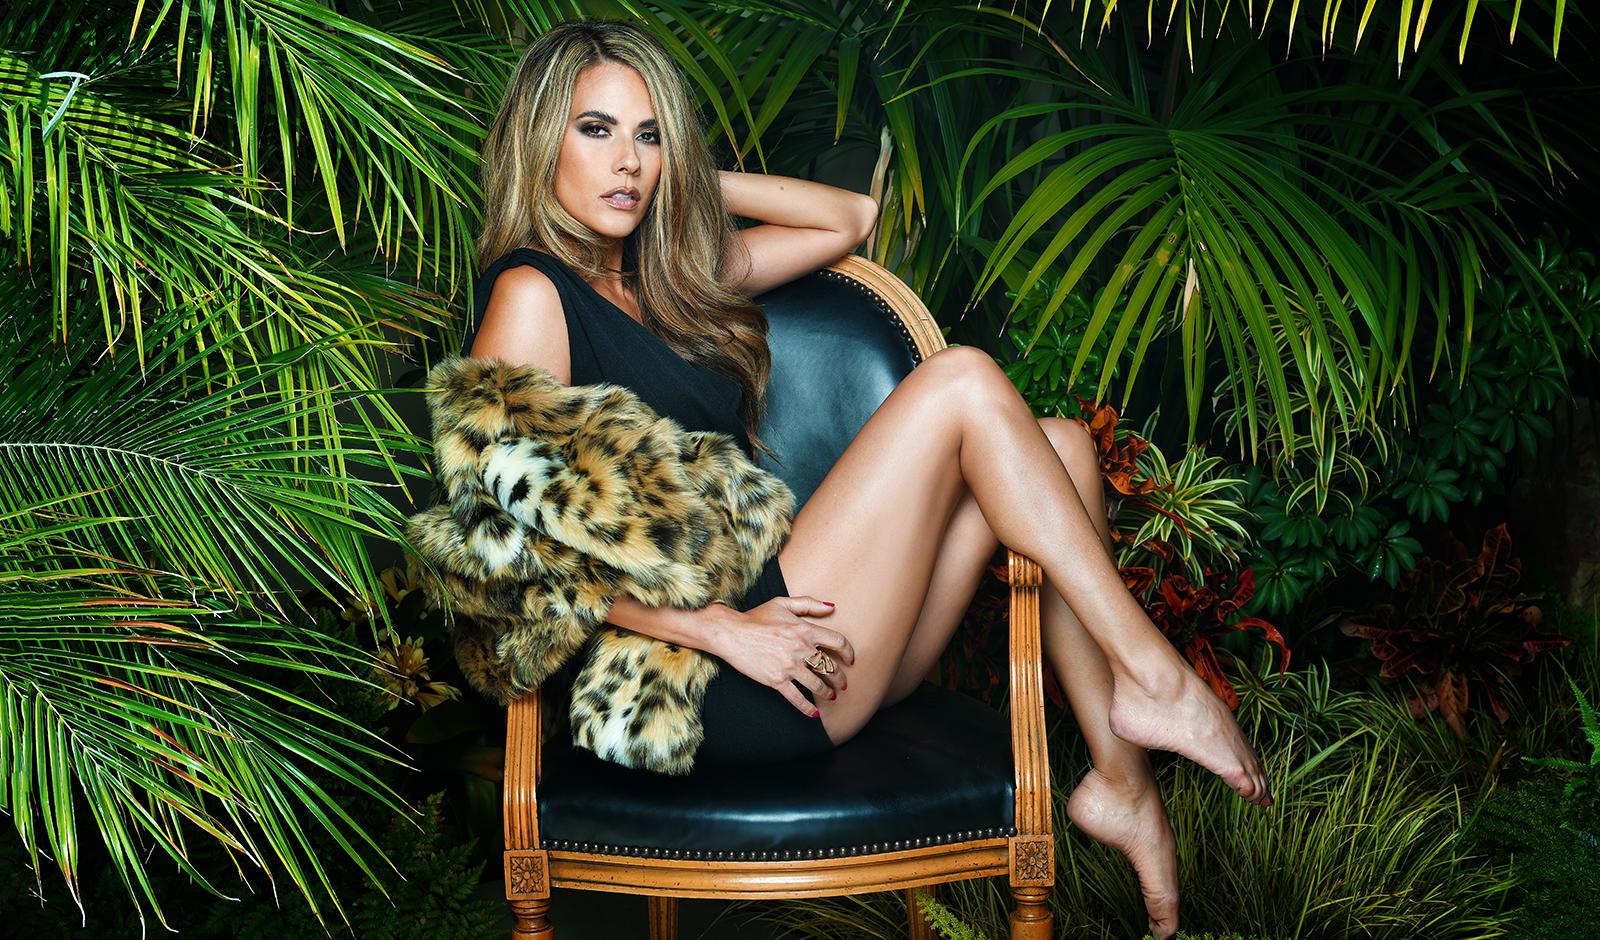 Bonnie-Jill-exclusive-interview-viva-glam-magazine-main-image